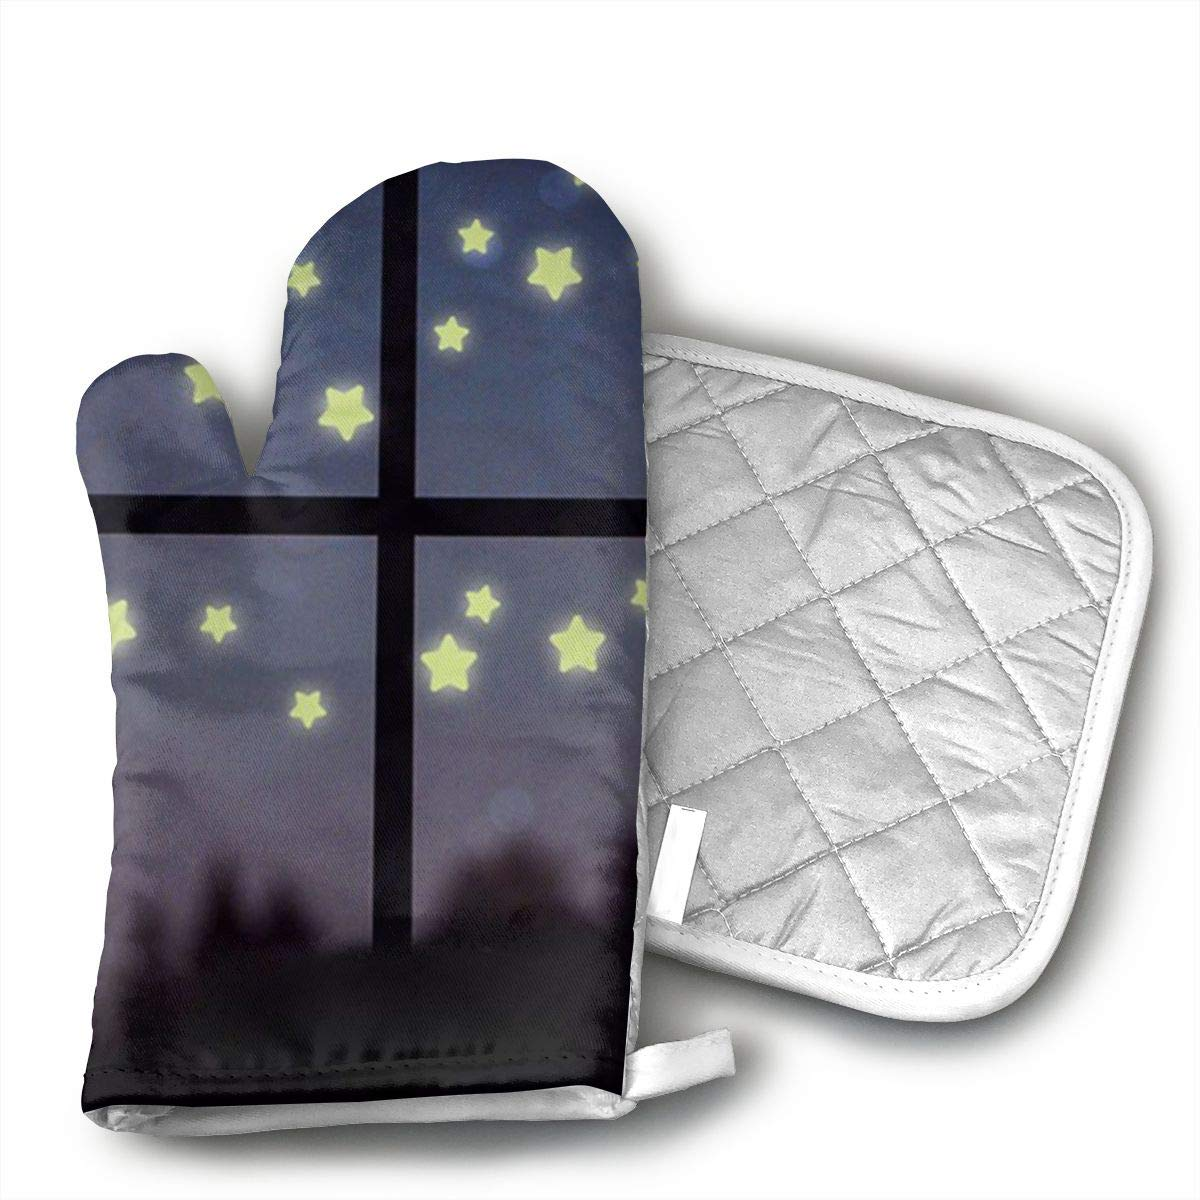 Glow in The Dark Luminous Oven Mitts Heat Resistance, Lining Kitchen Gloves, Heat Resistant